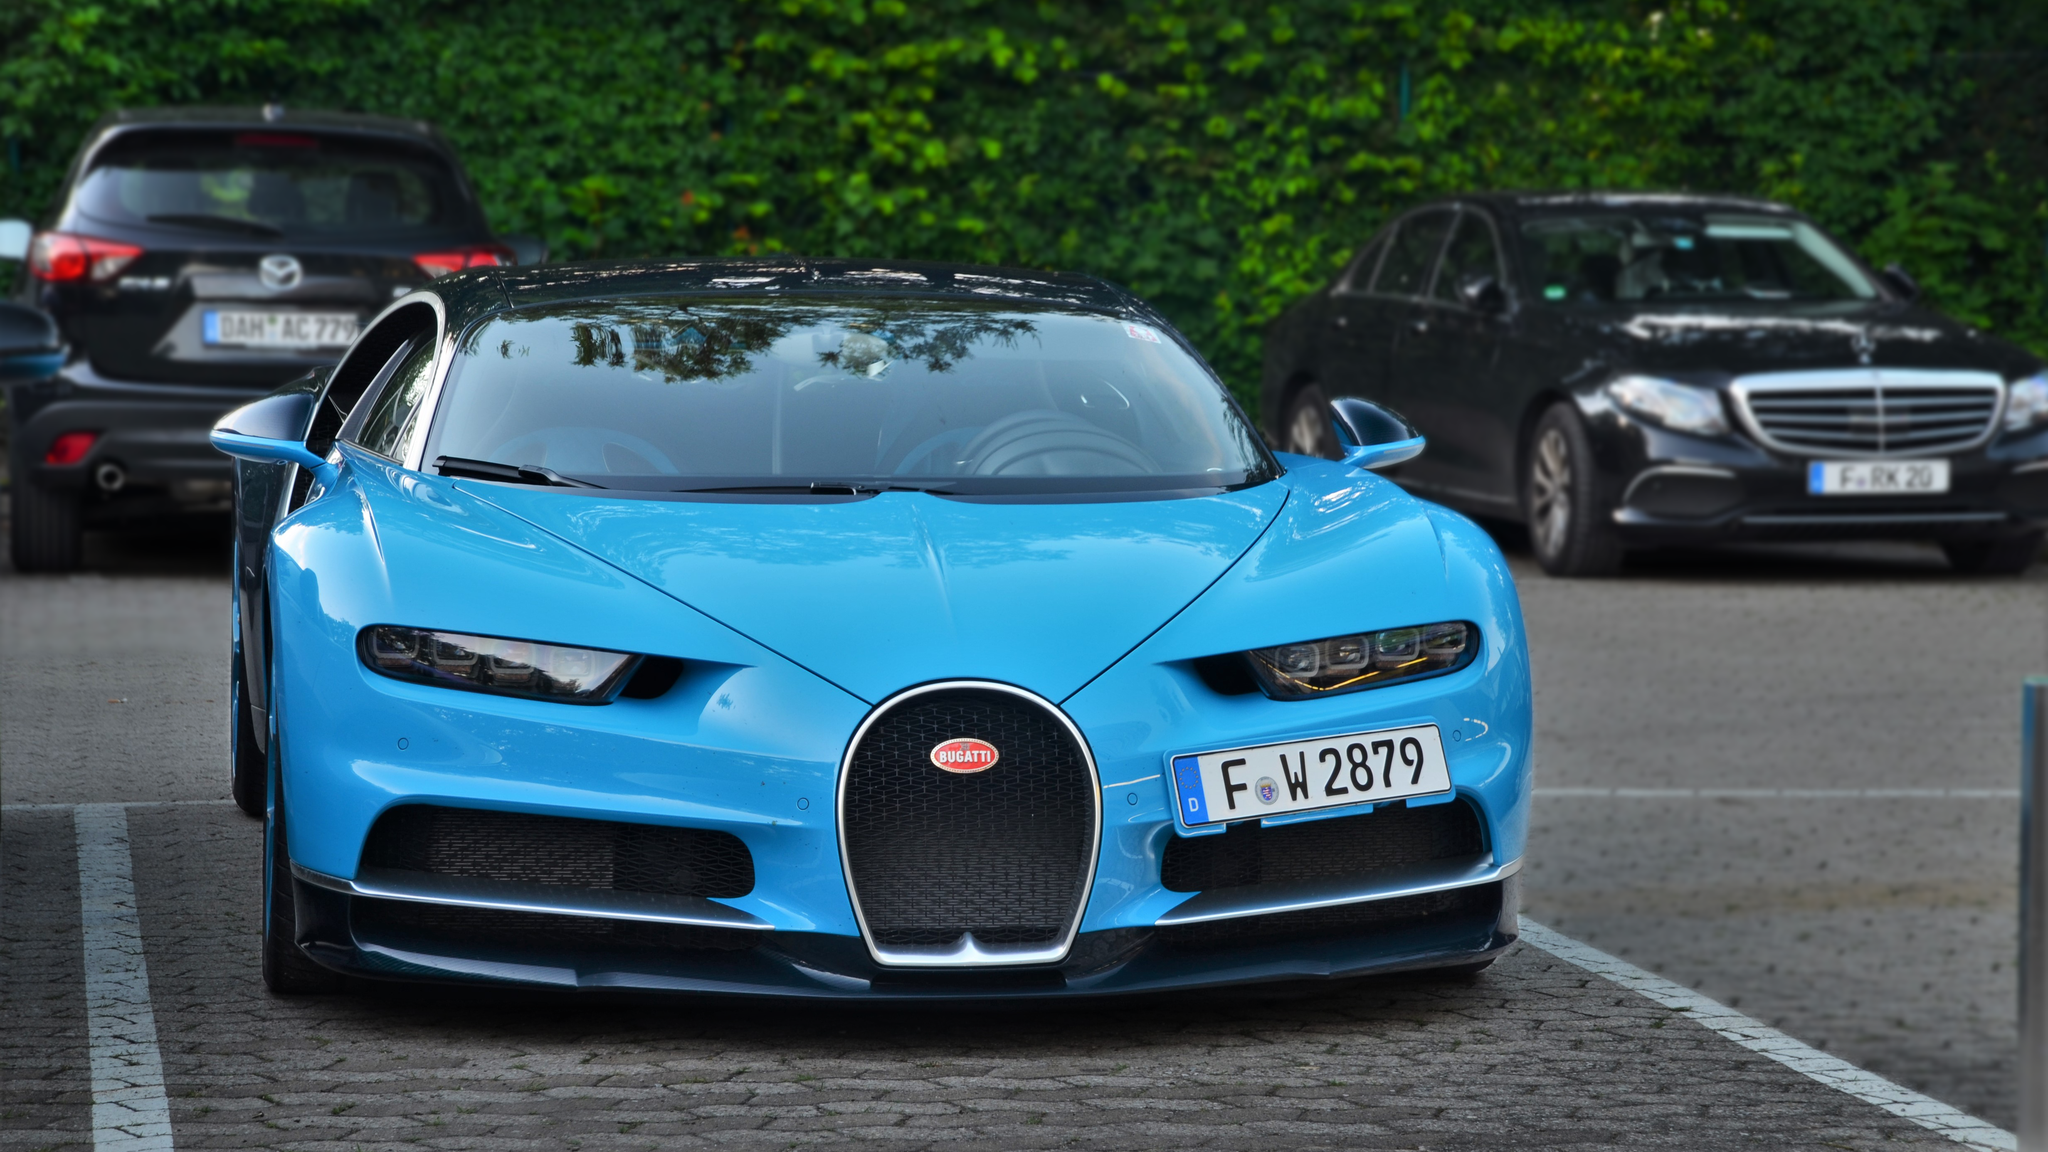 Bugatti Chiron - F-W-2879